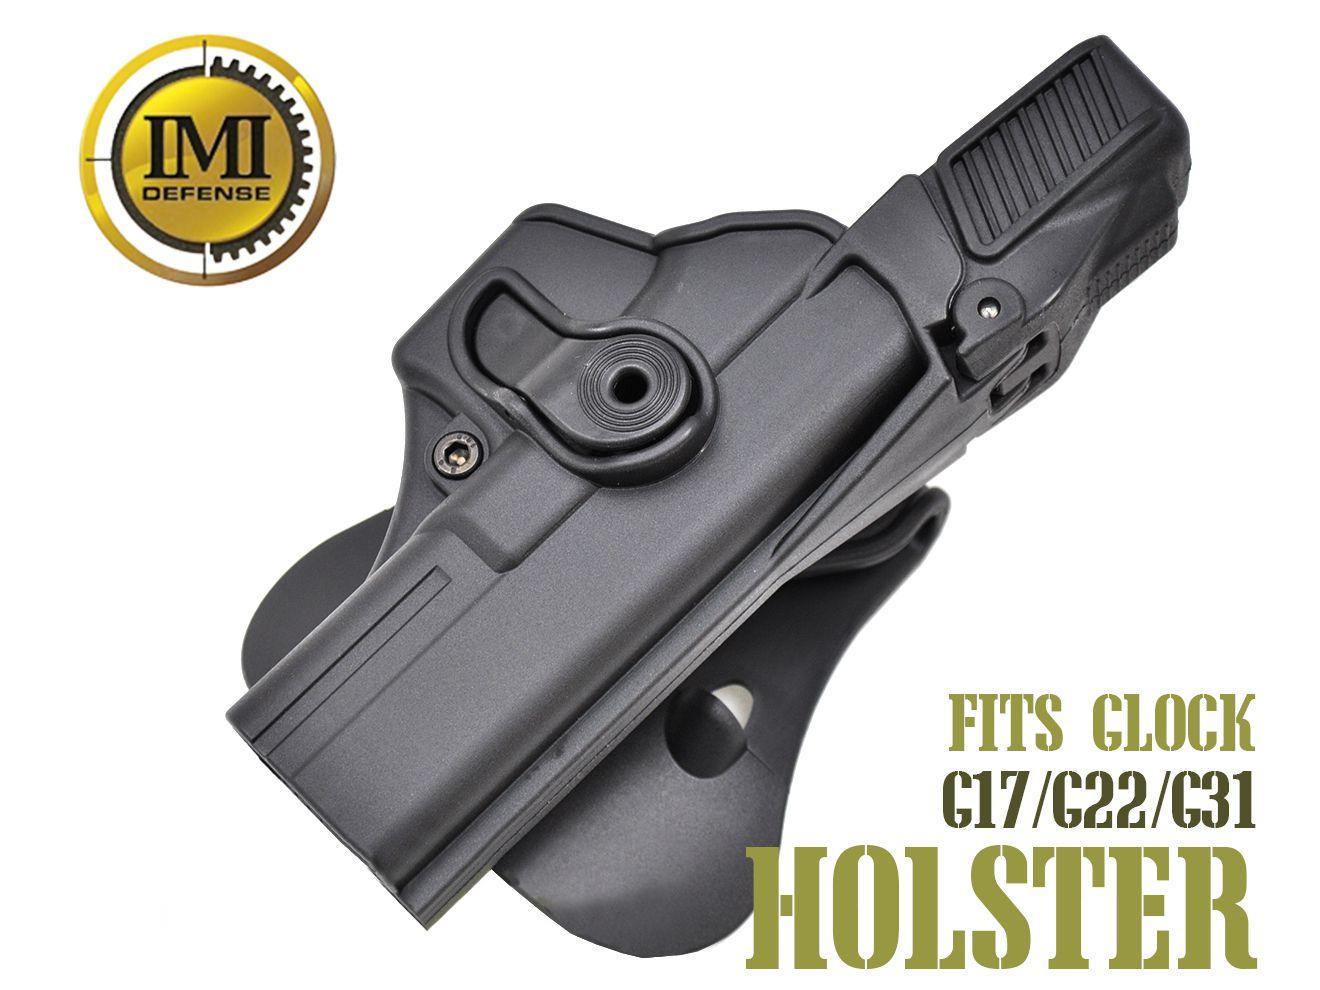 IMI DEFENSE パドルホルスター for G17/G22/G31 右用 BK